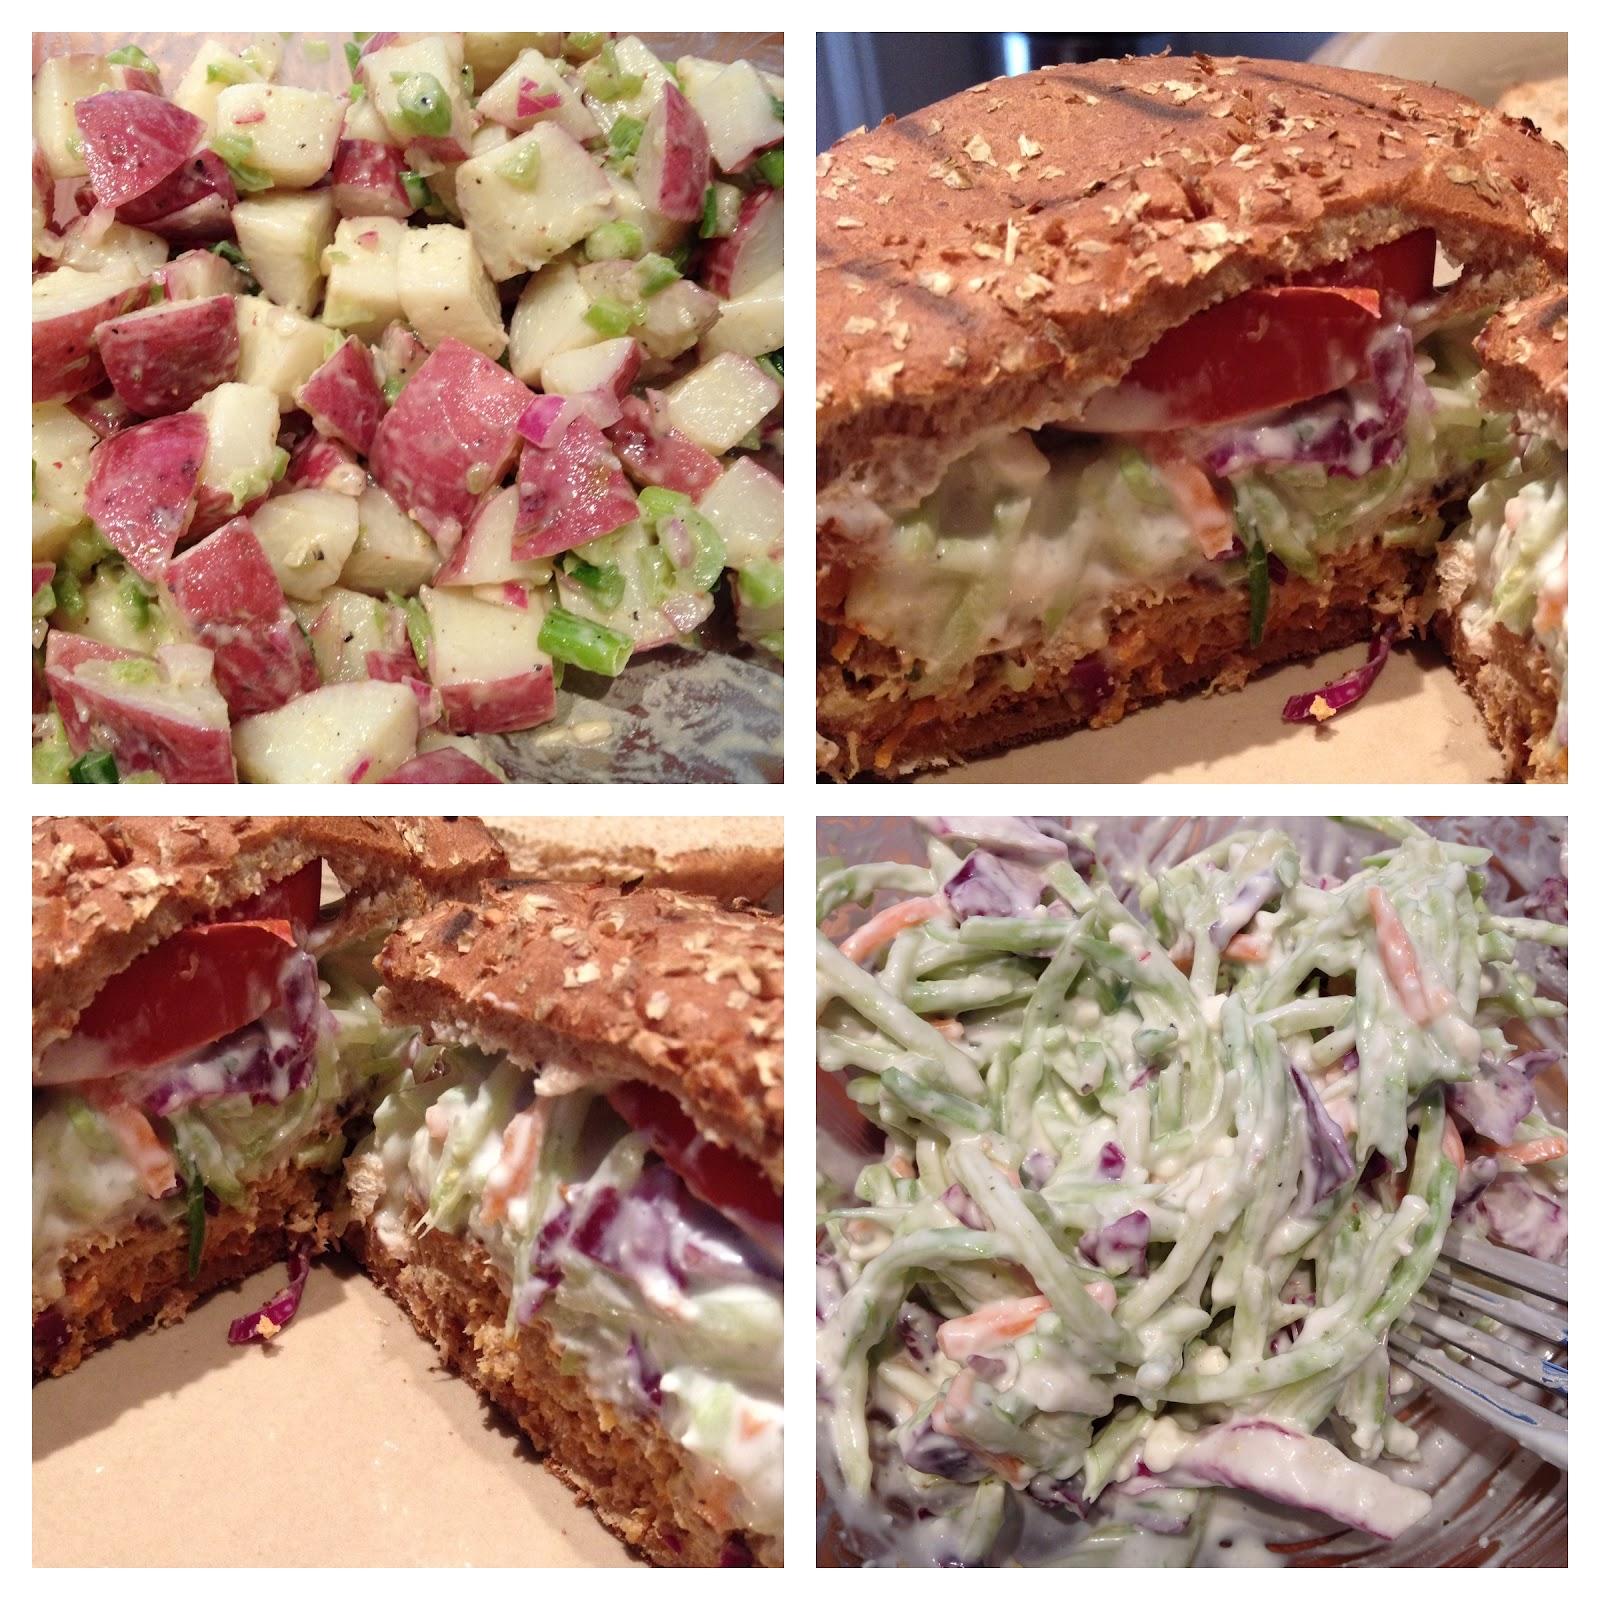 buffalo turkey burgers with blue cheese broccoli slaw + potato salad